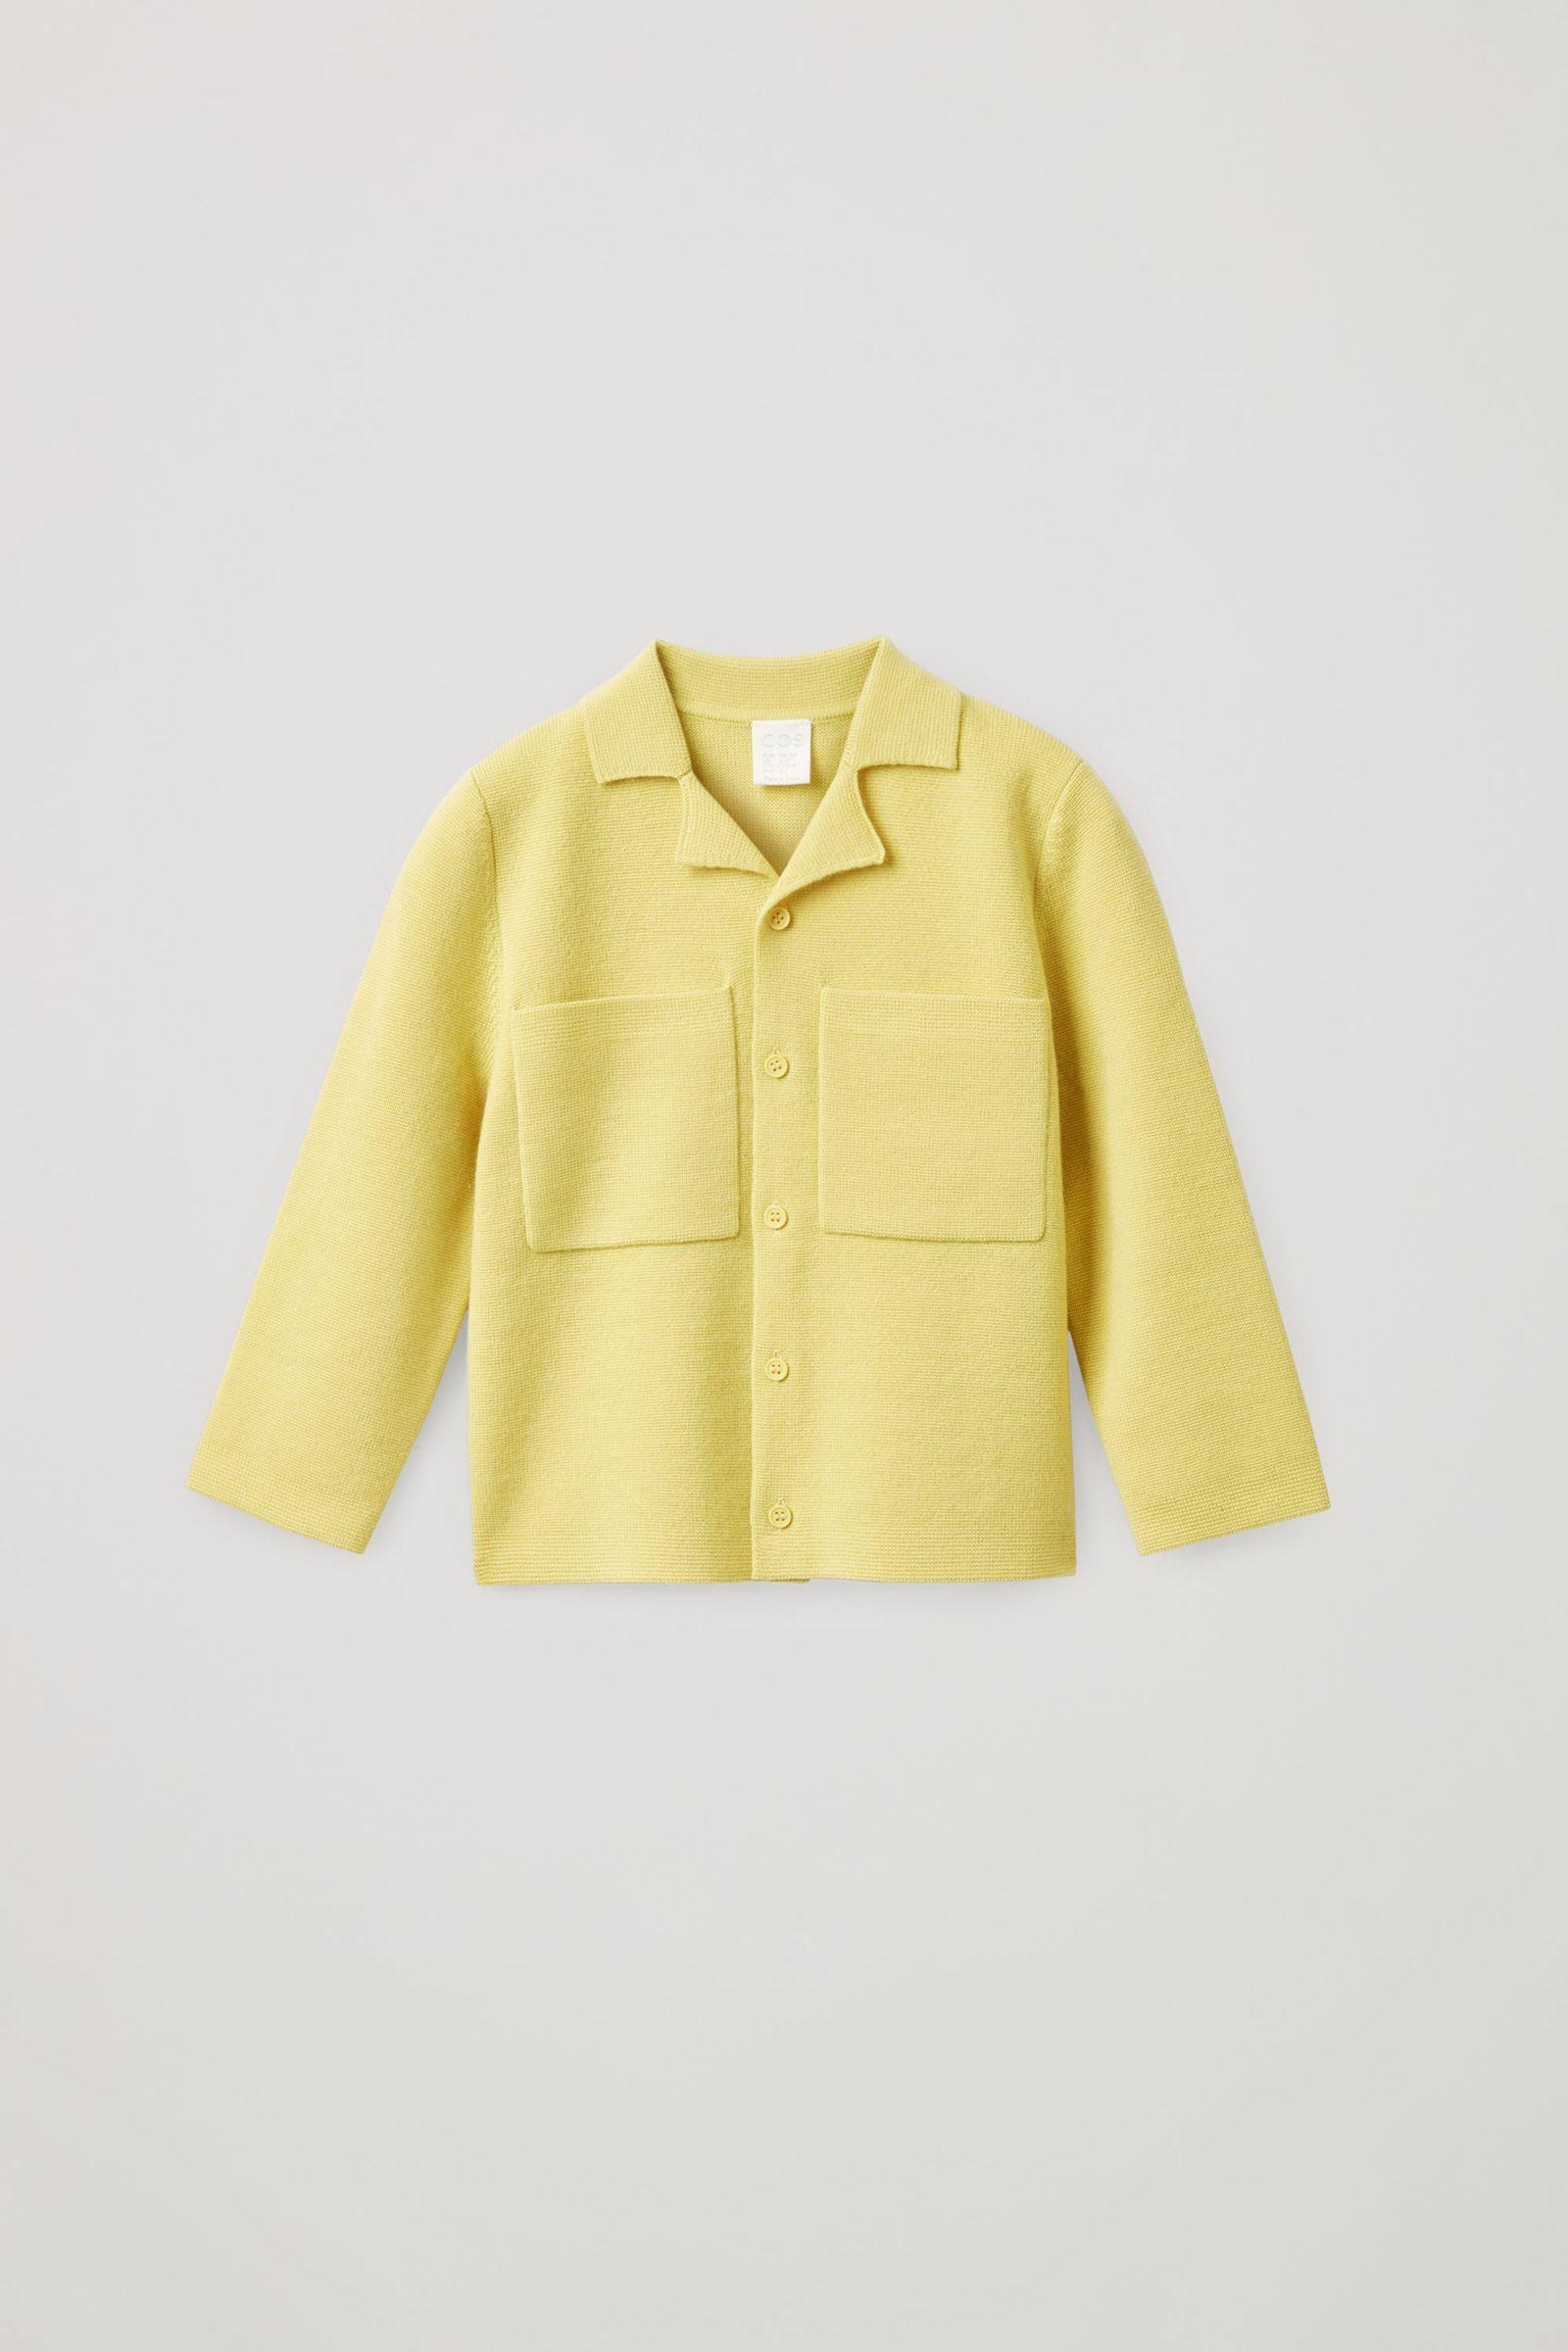 COS 니티드 울 재킷의 옐로우컬러 Product입니다.